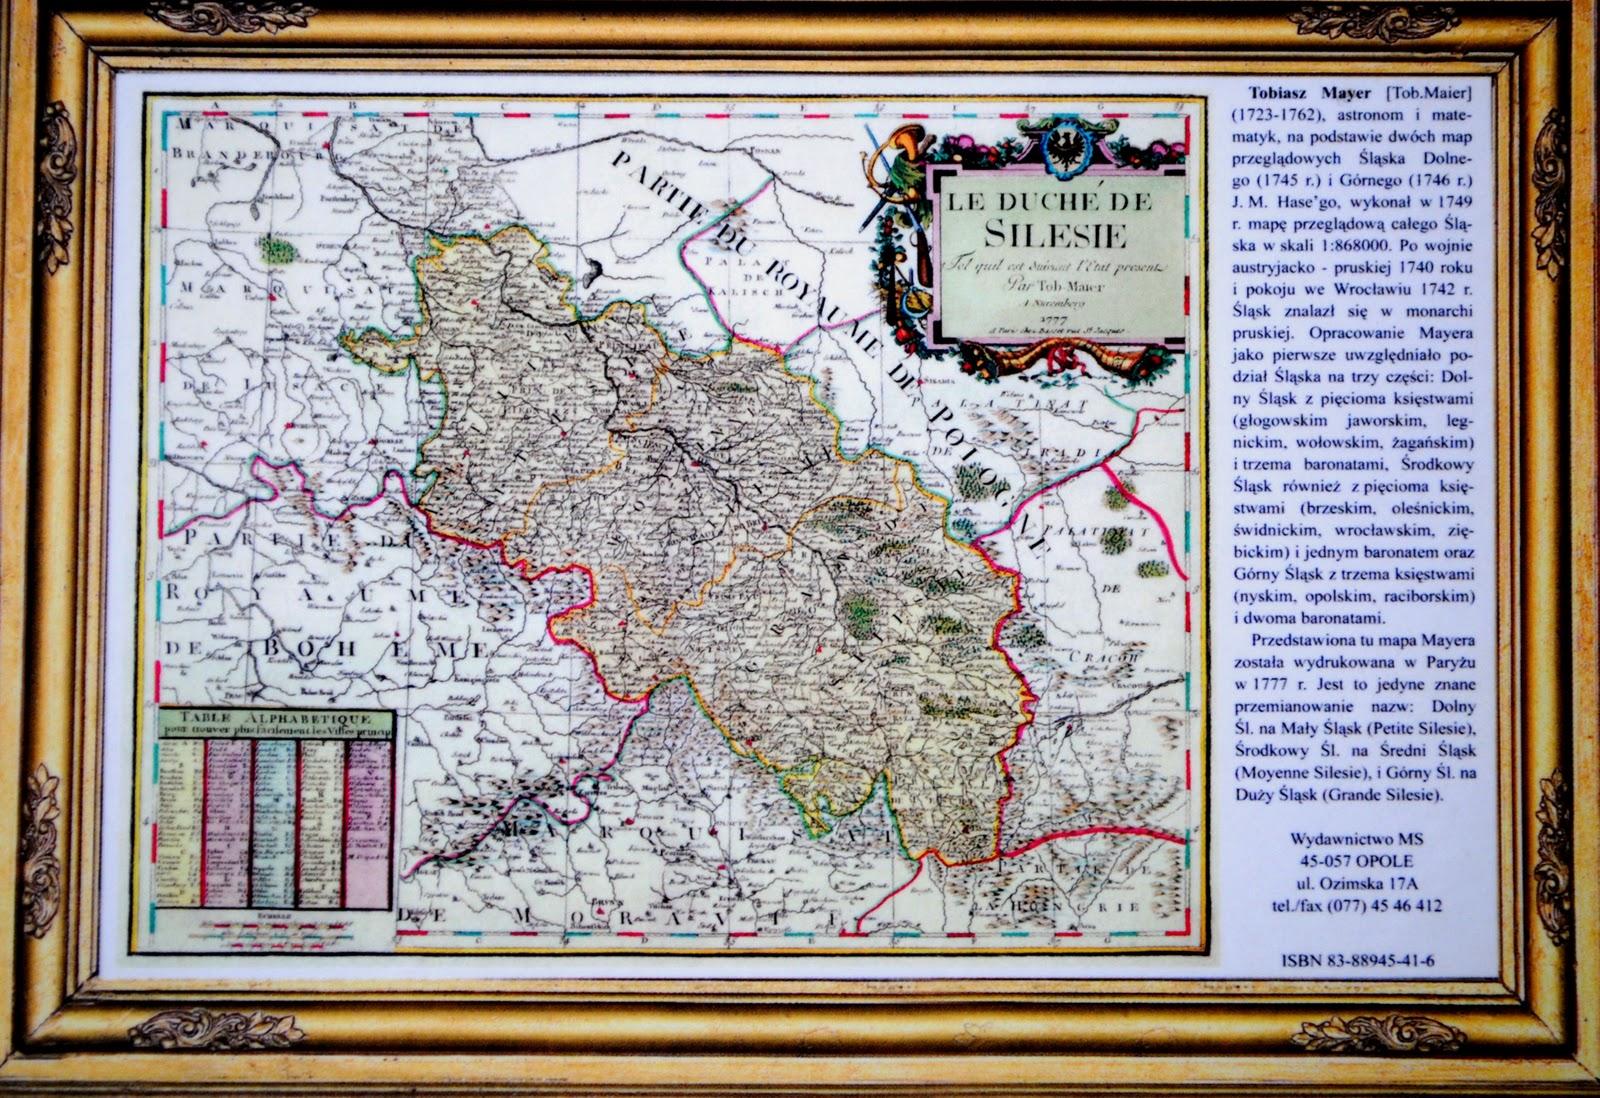 Reprodukcja starej mapy